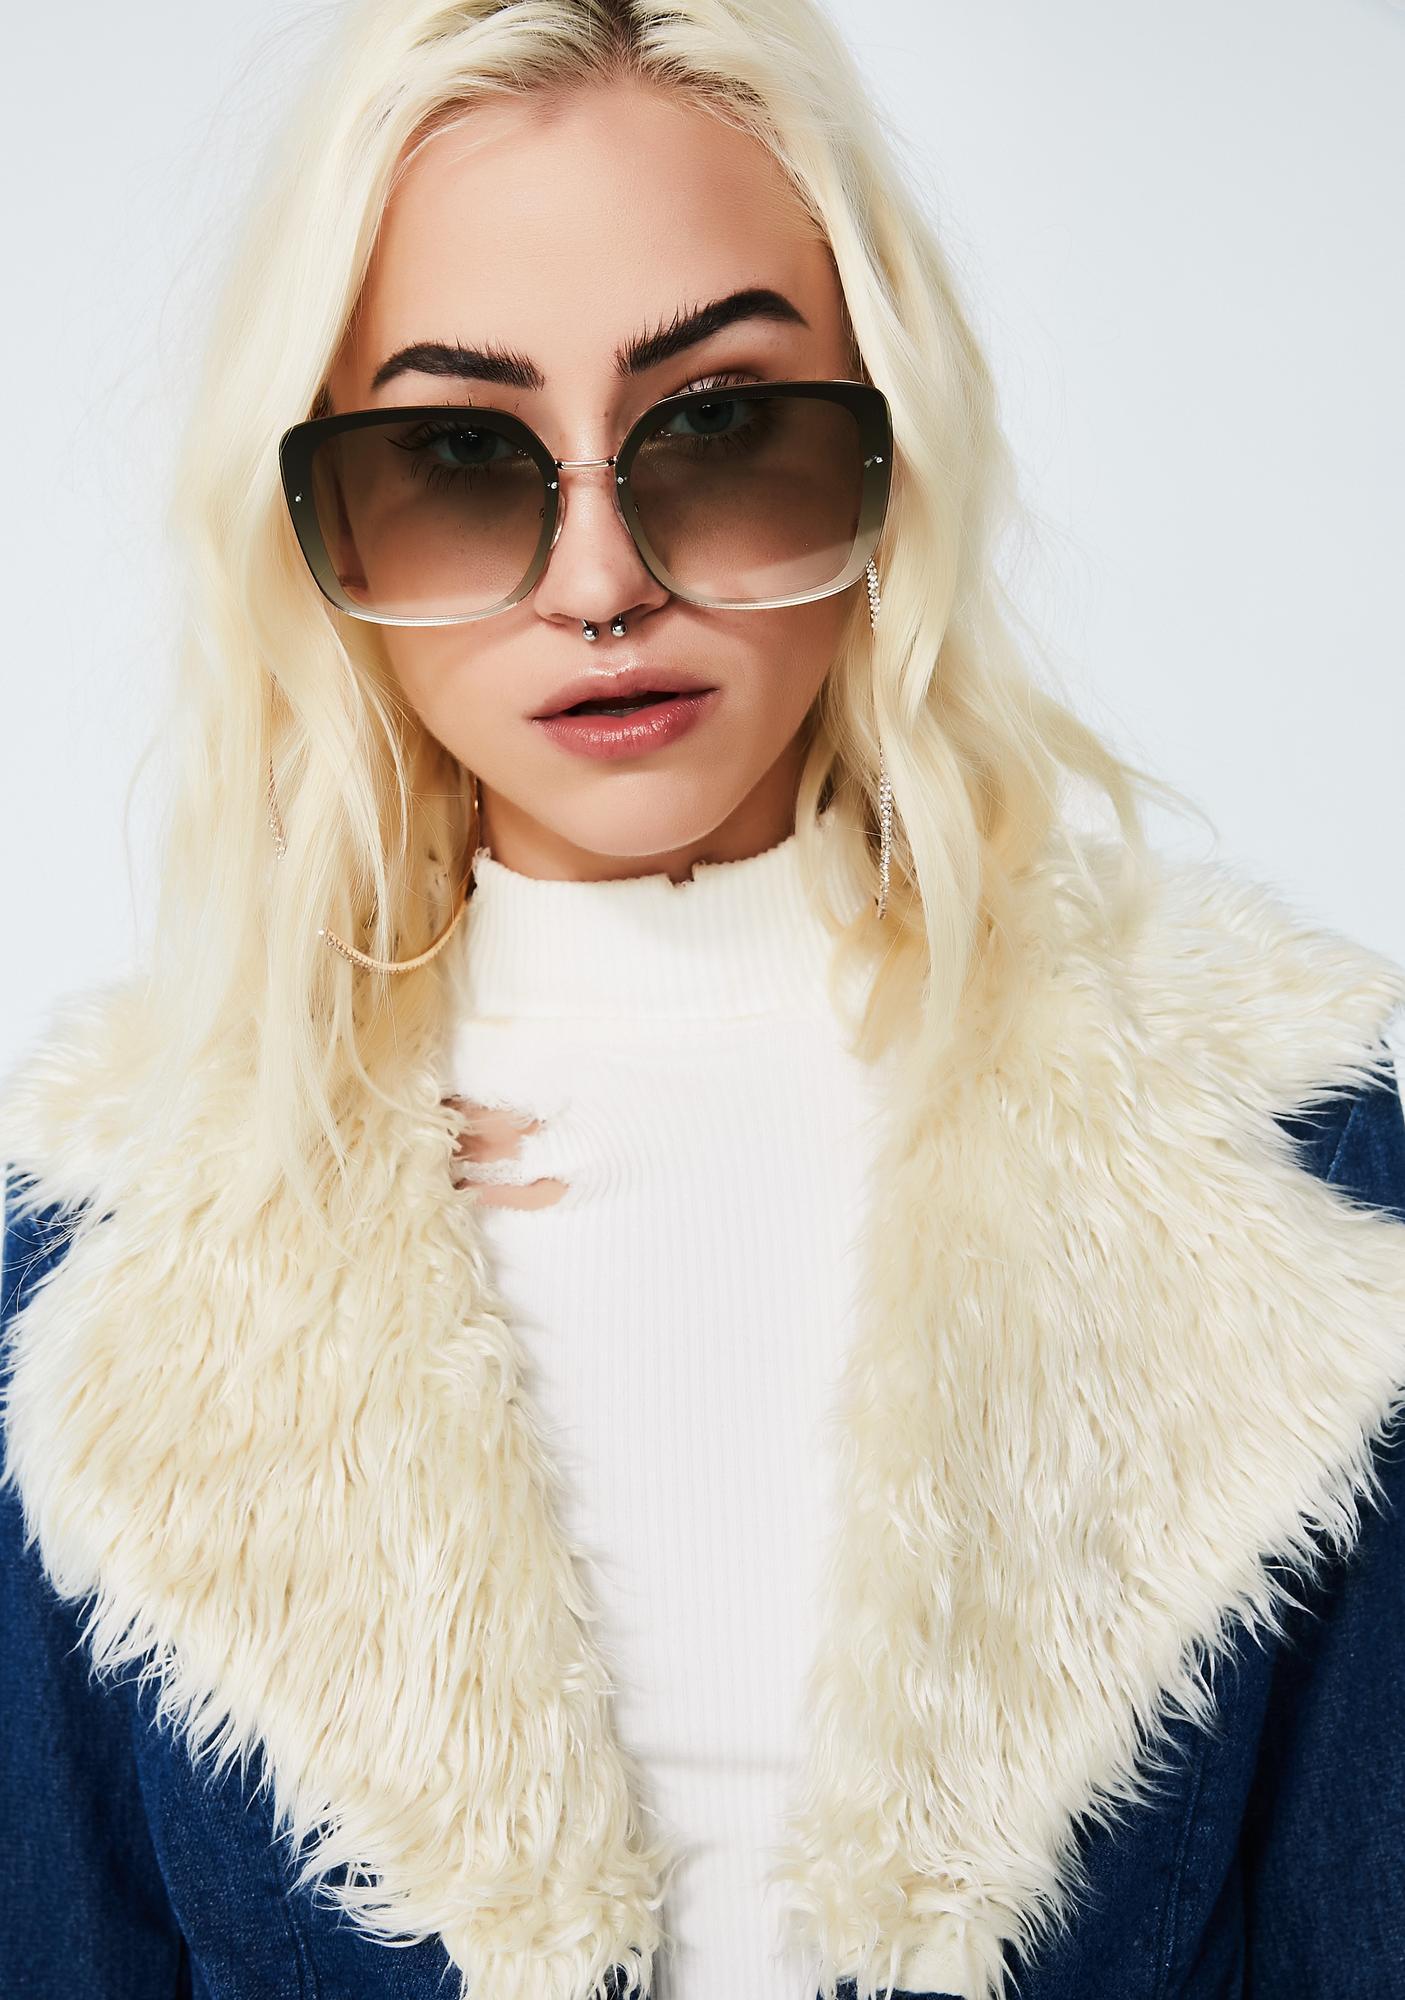 See Ya Never Ombre Sunglasses